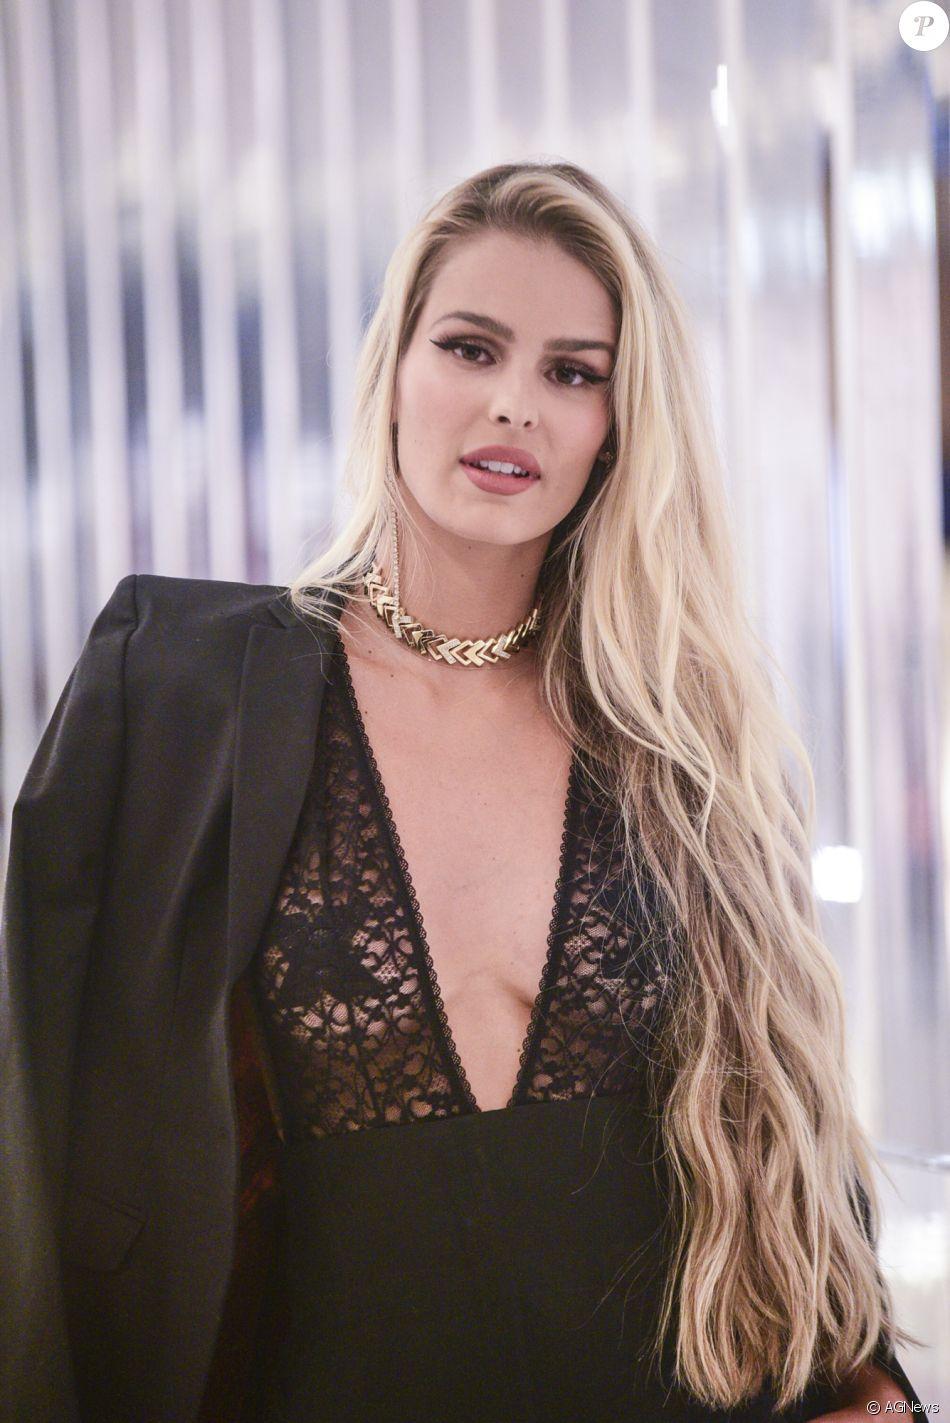 Hot Yasmin Brunet nudes (49 foto and video), Tits, Bikini, Boobs, underwear 2020